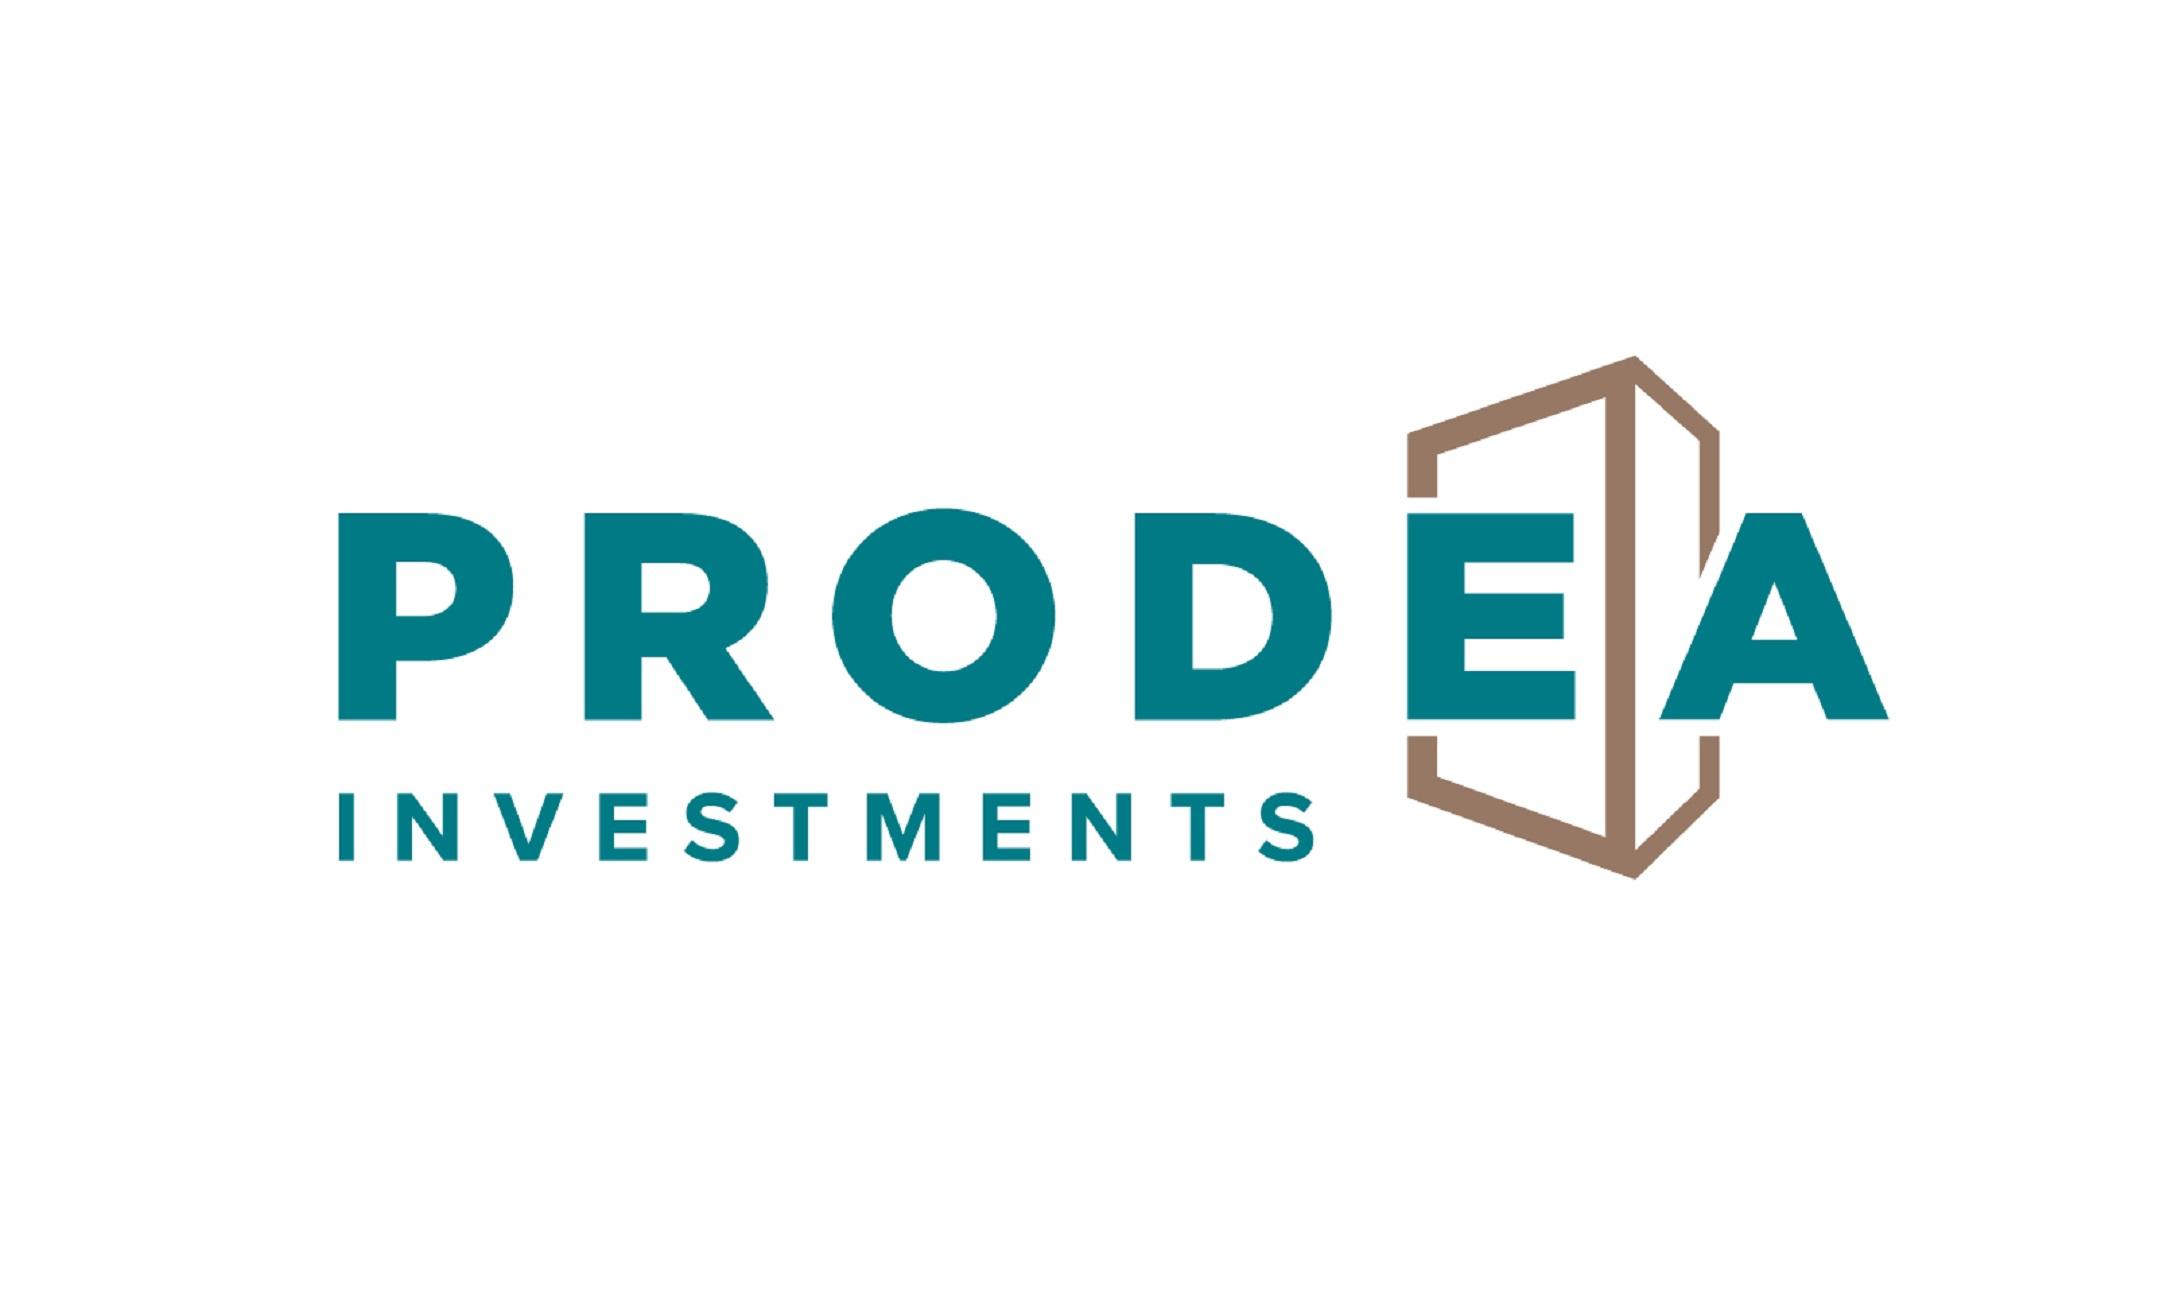 ProdeaInvestments: Πώληση χαρτοφυλακίου ακινήτων έναντι €134,2 εκατ.